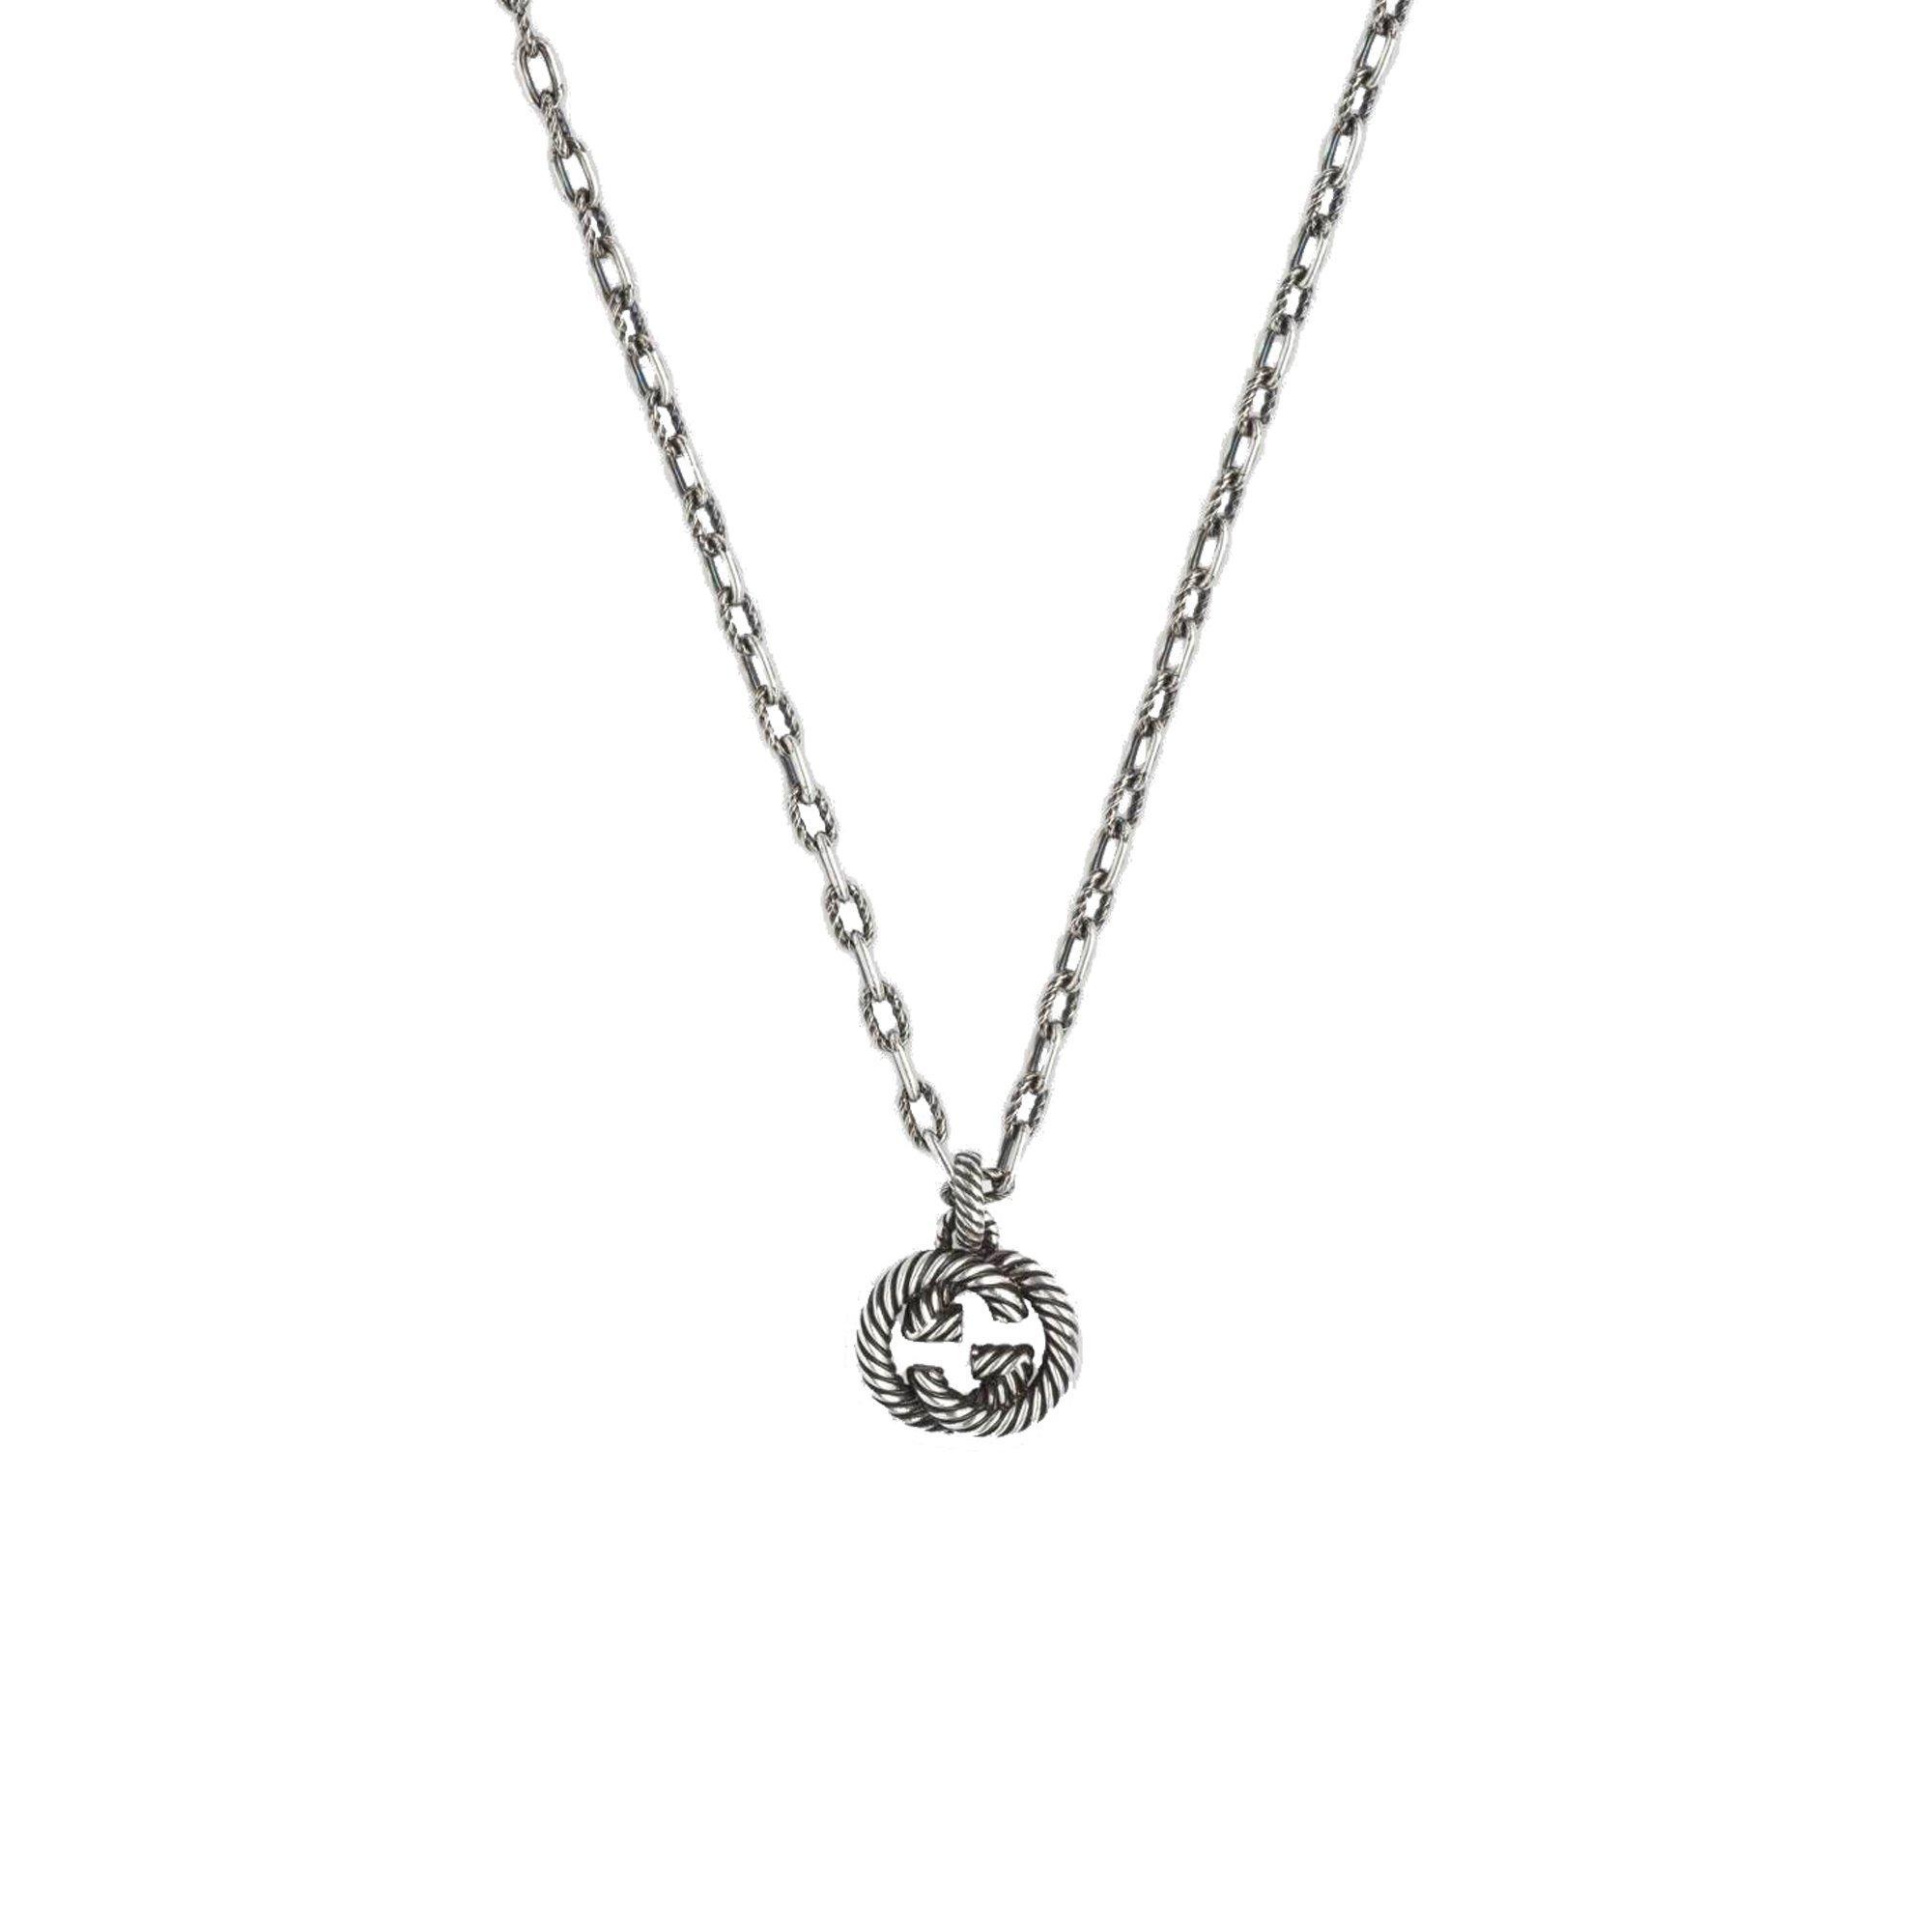 Collana Gucci Interlocking G in argento YBB60415500100U